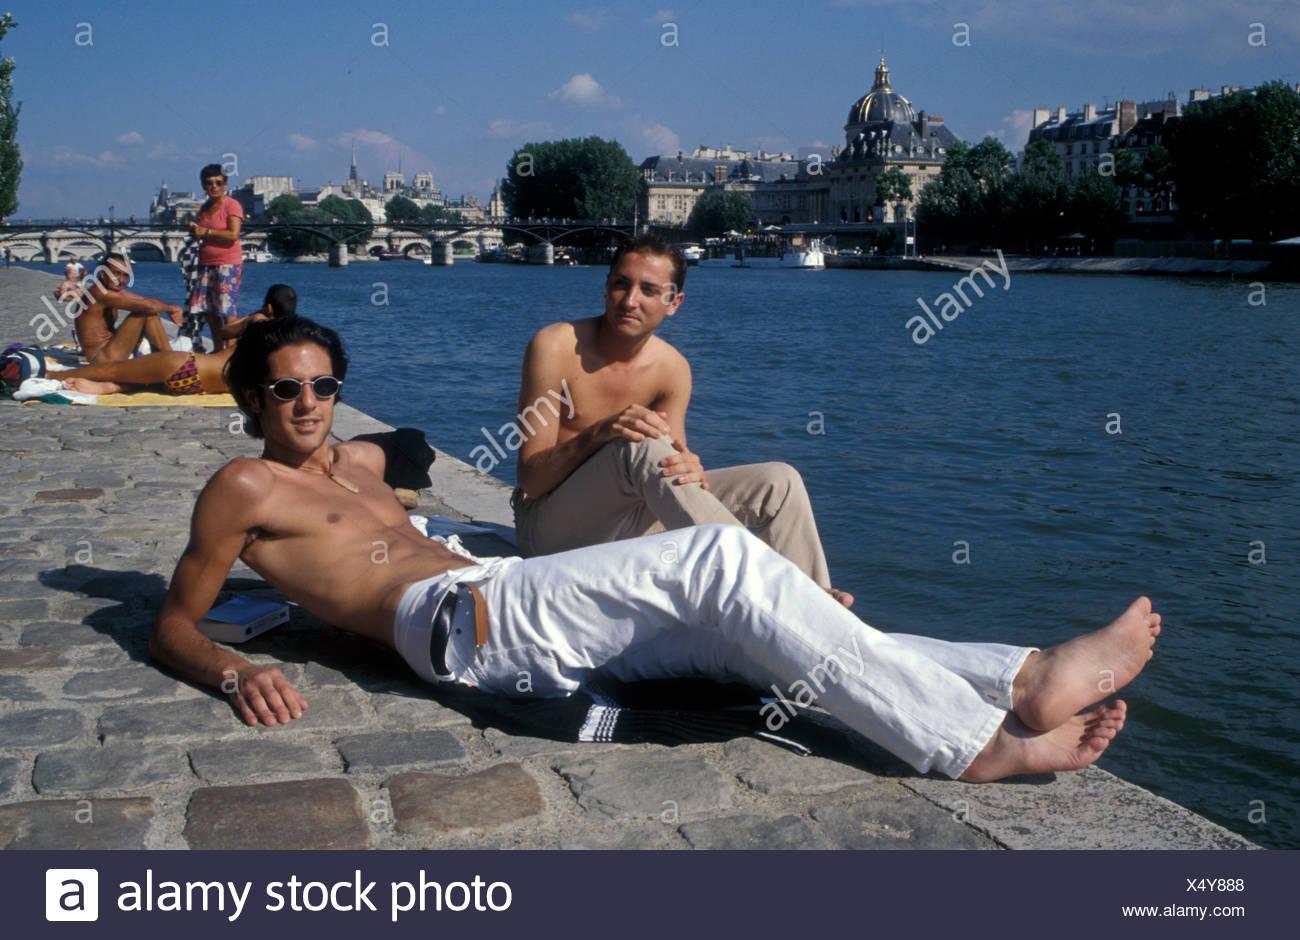 Gay Men Sunbathing On Tata Beach Next To River Seine Paris France 1997